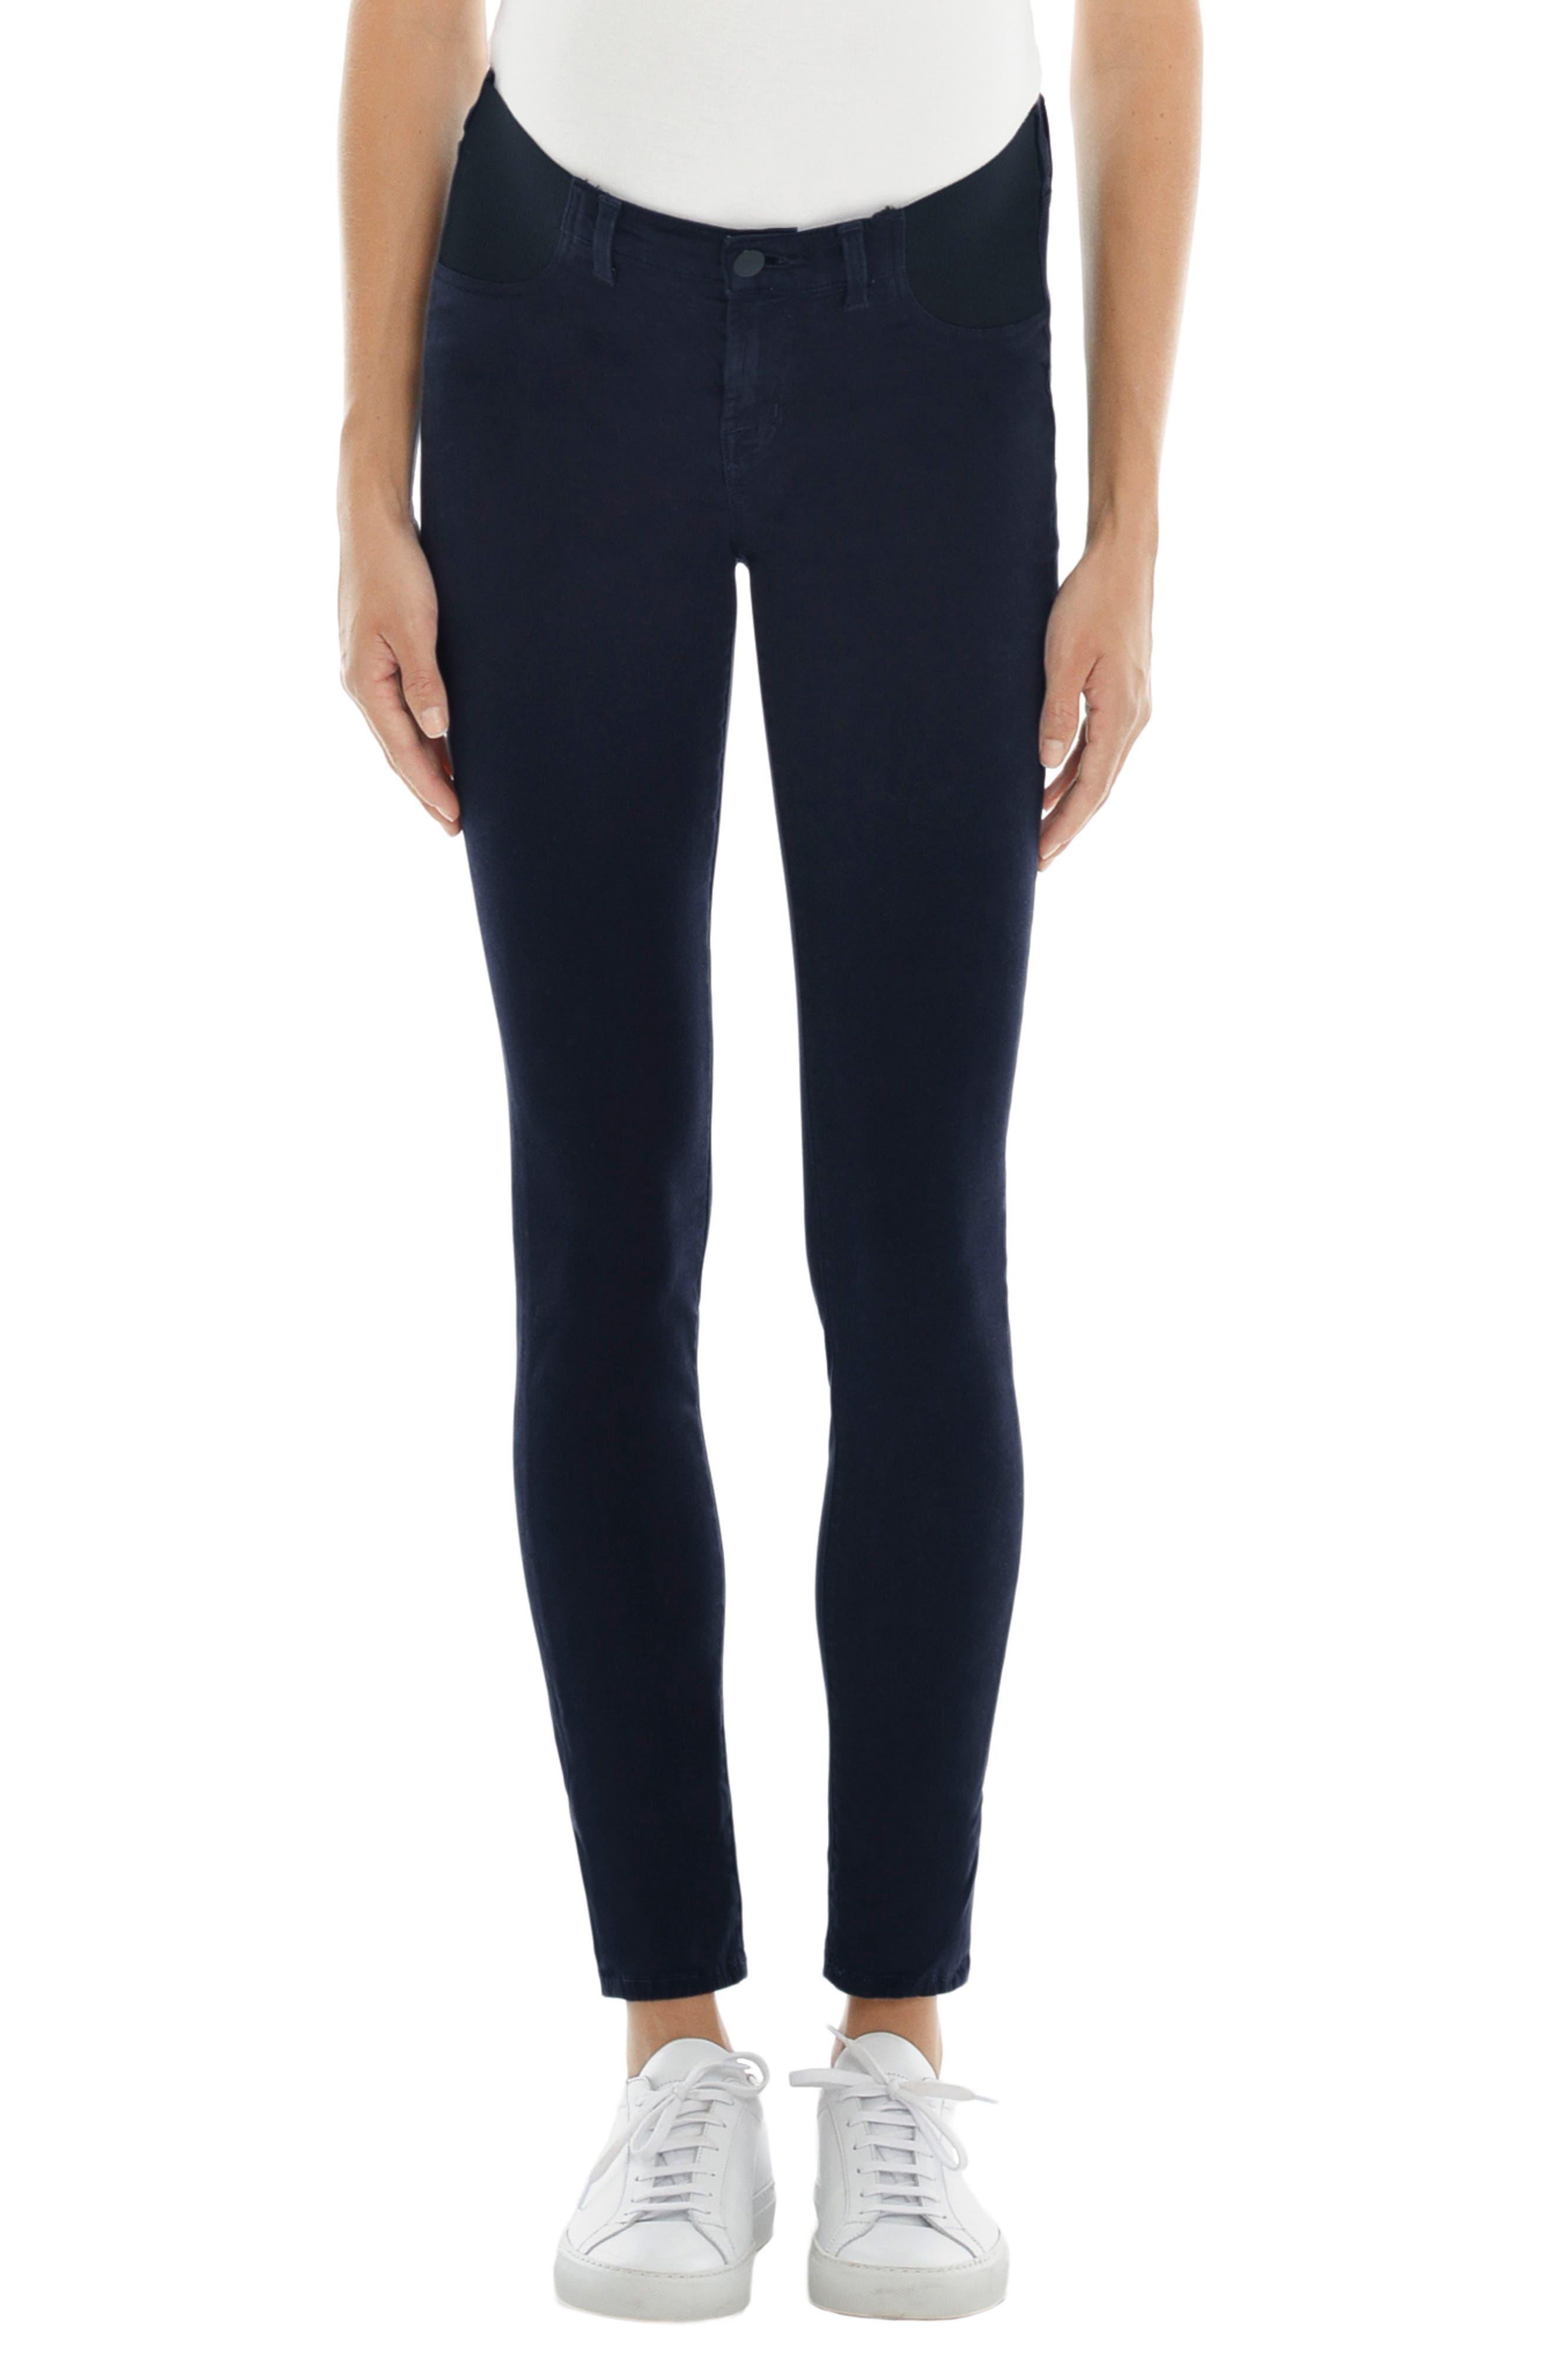 Alternate Image 1 Selected - J Brand Mama J Luxe Sateen Maternity Skinny Jeans (Dark Navy)